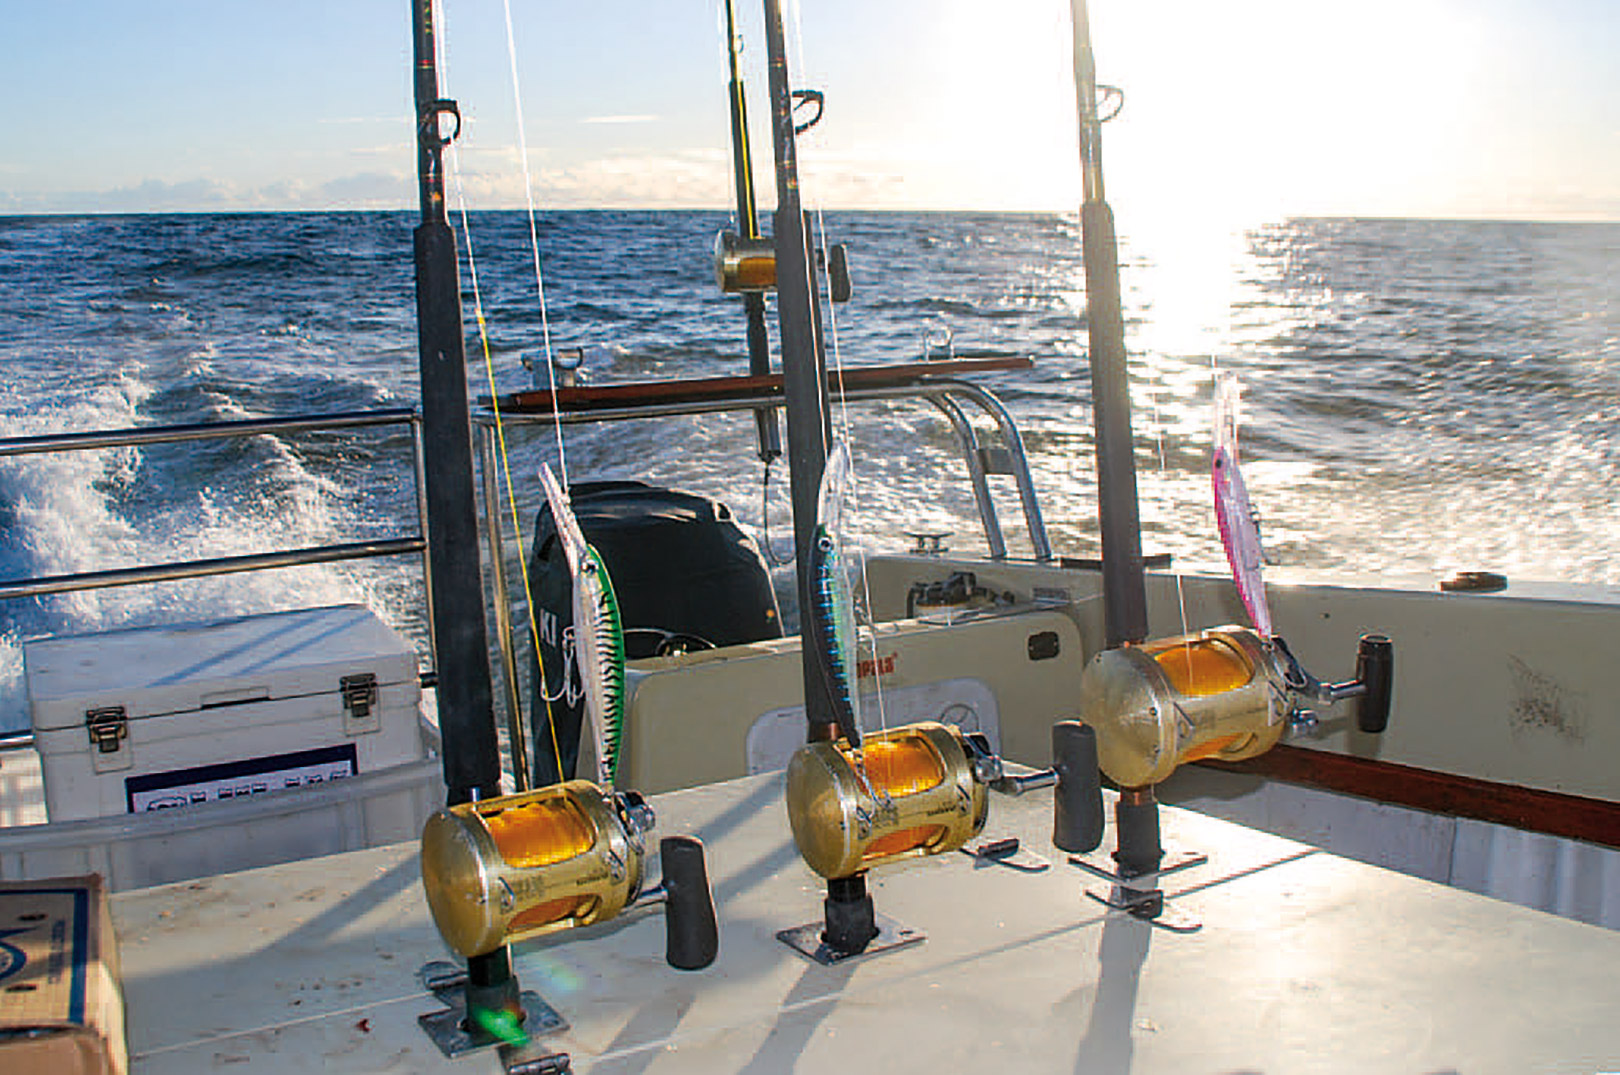 Fiskeri efter yellowfin tuna